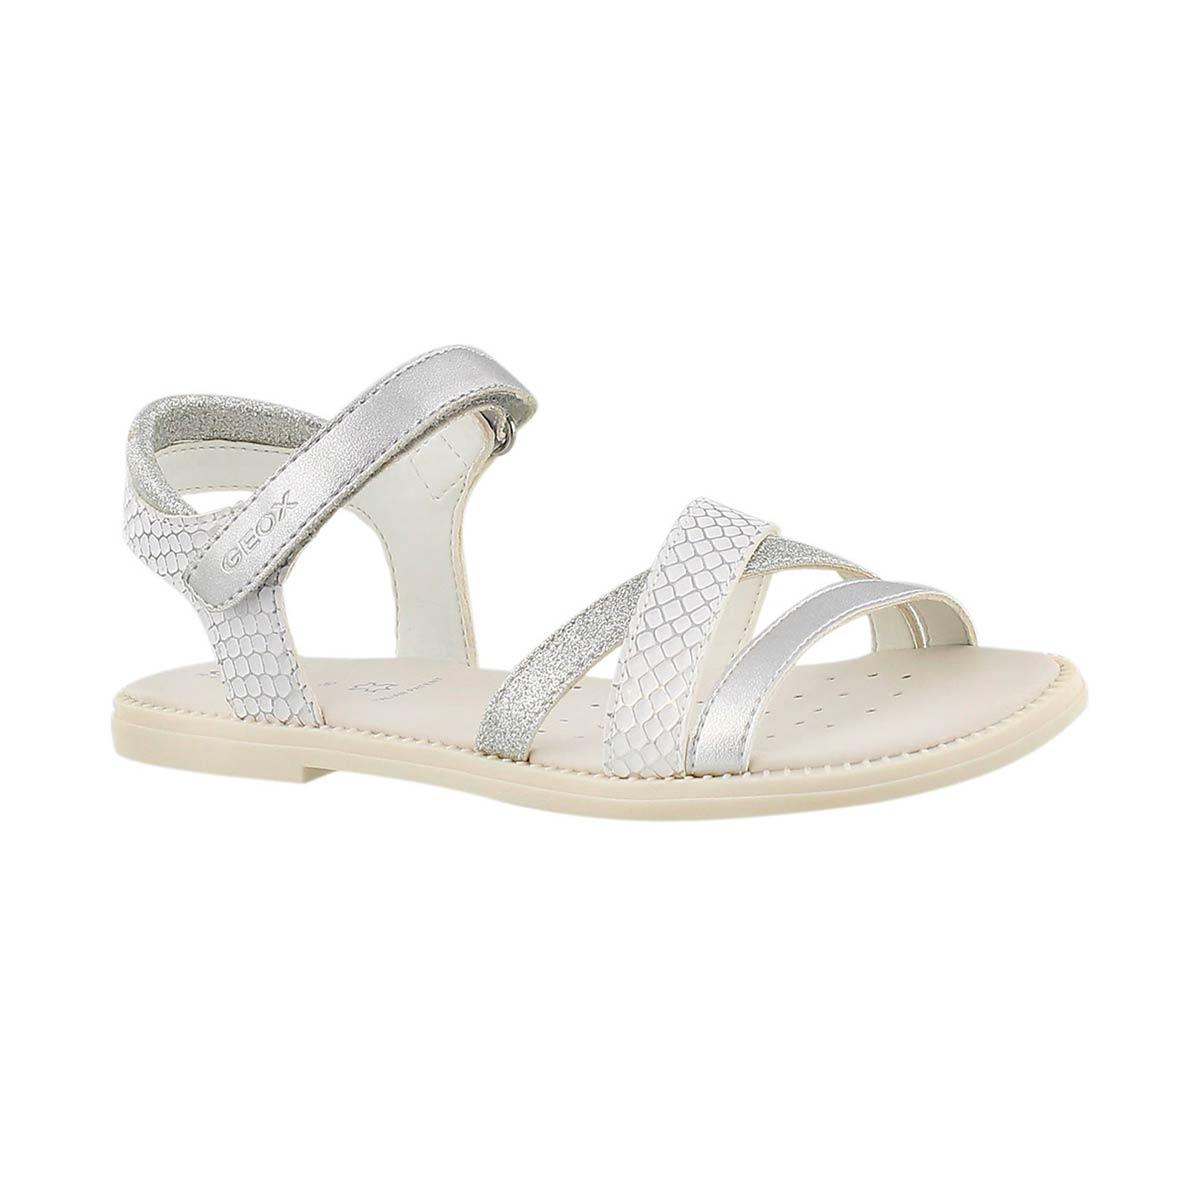 Girls' KARLY white/silver dress sandals